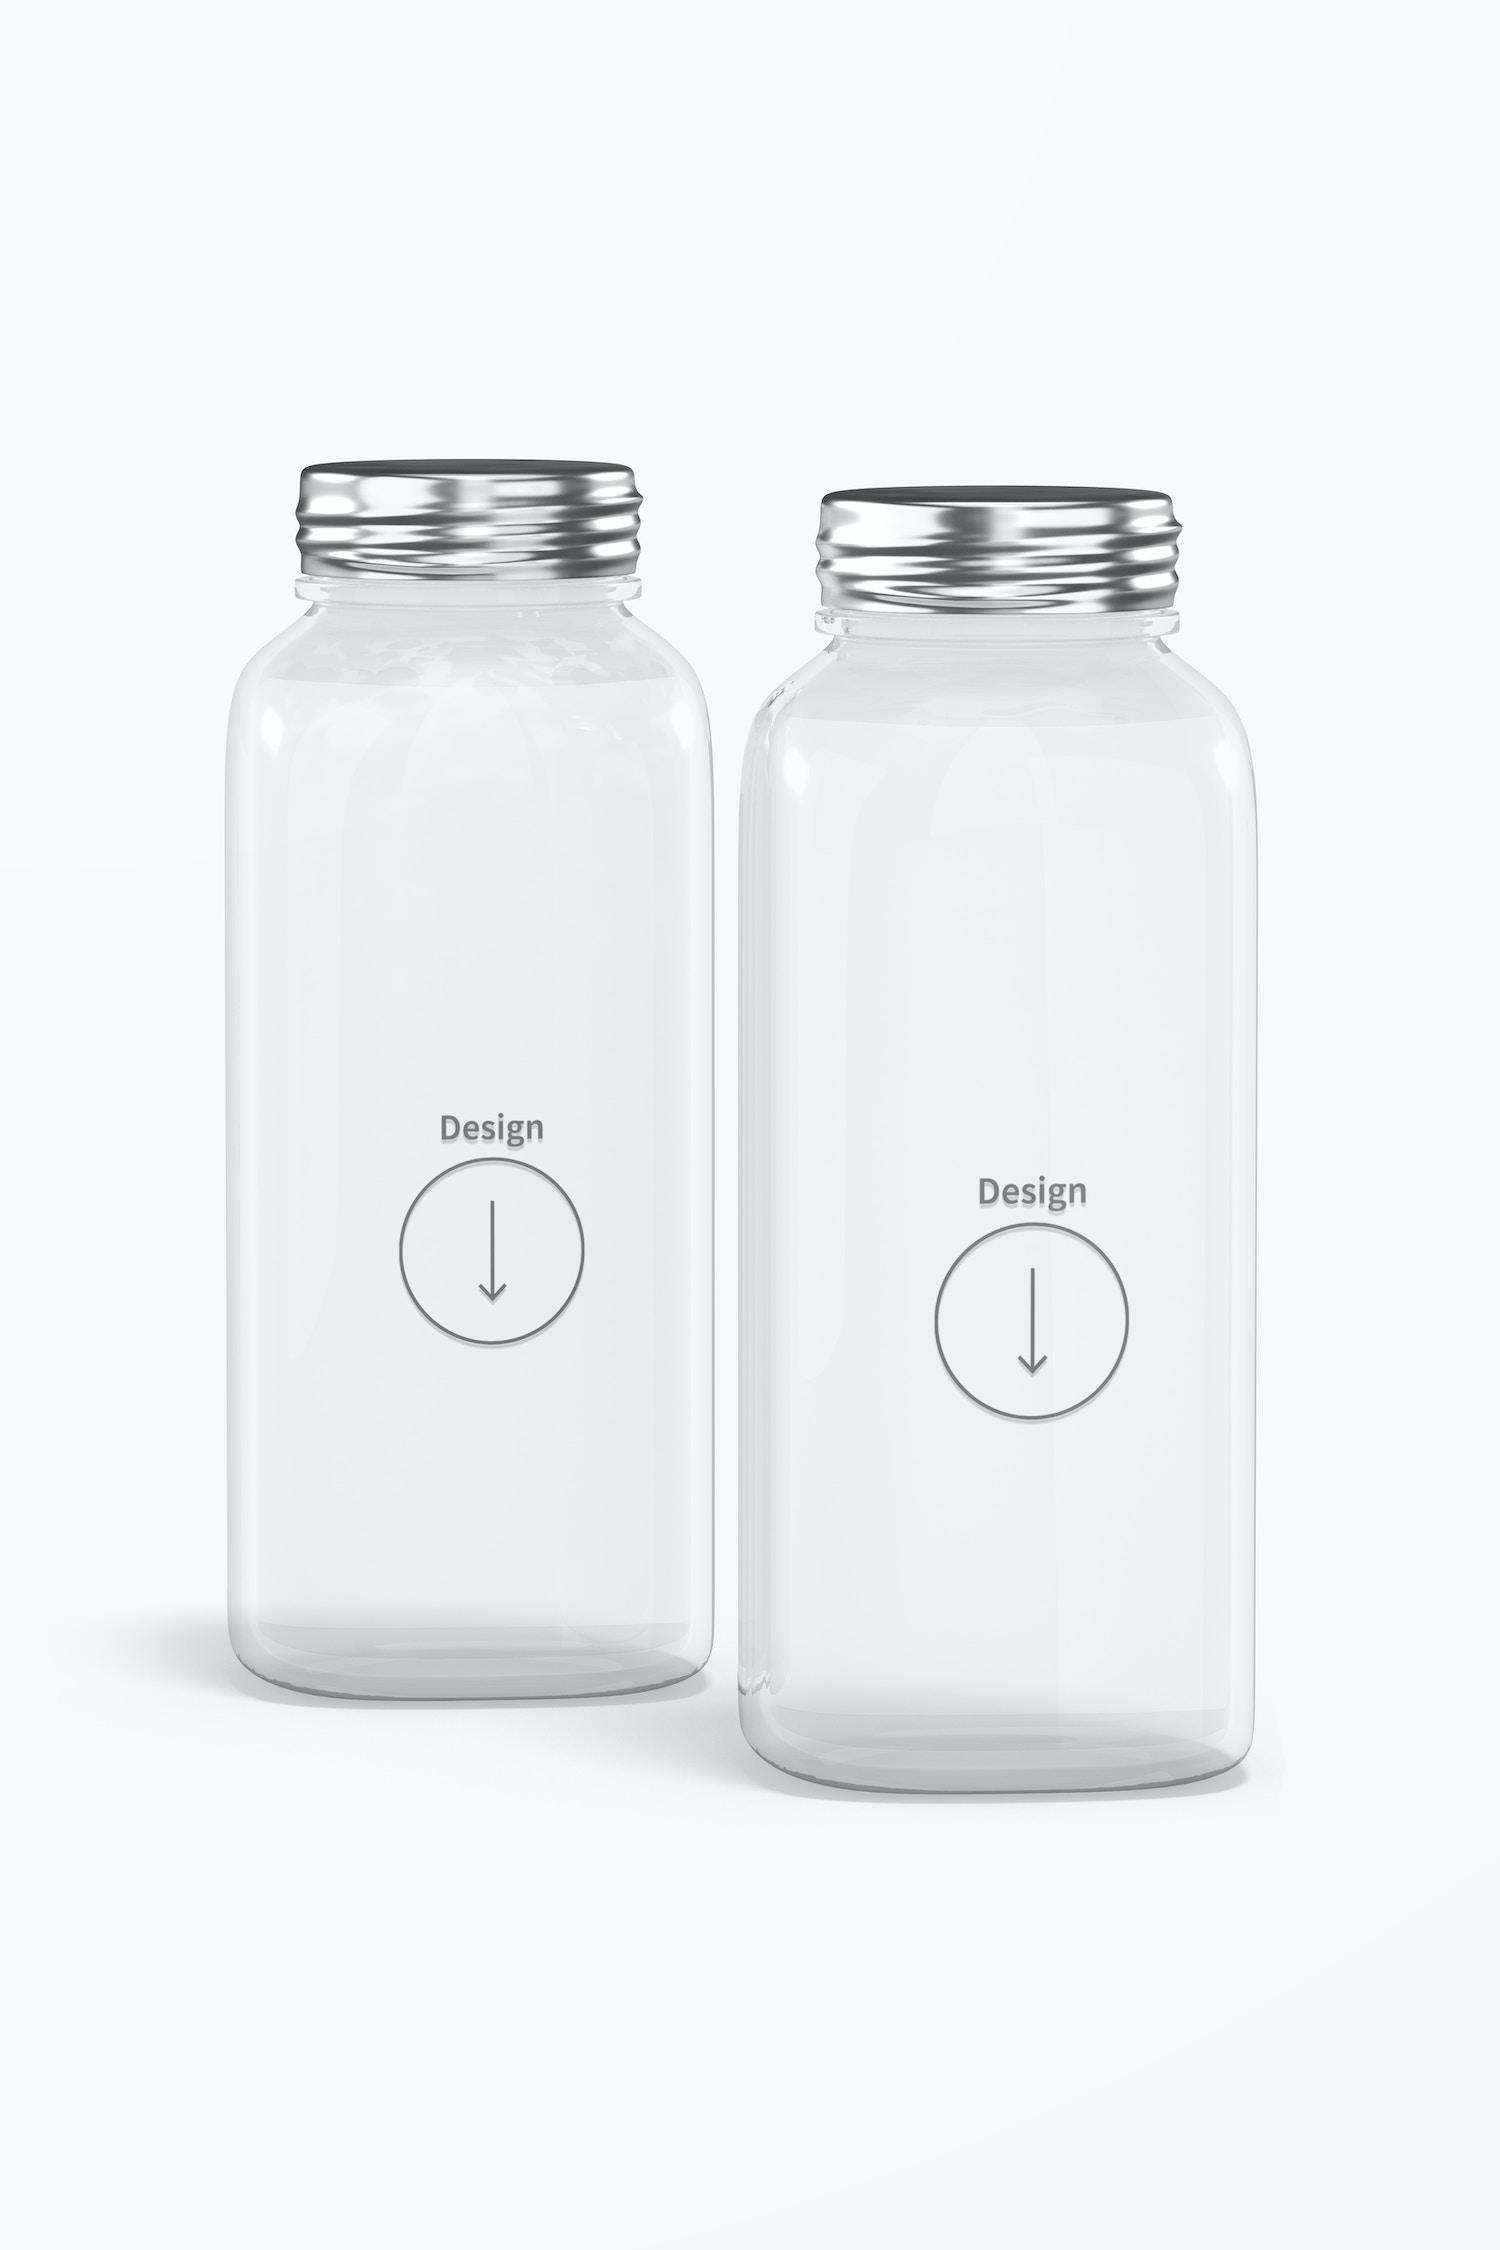 12 oz Glass Bottles Mockup